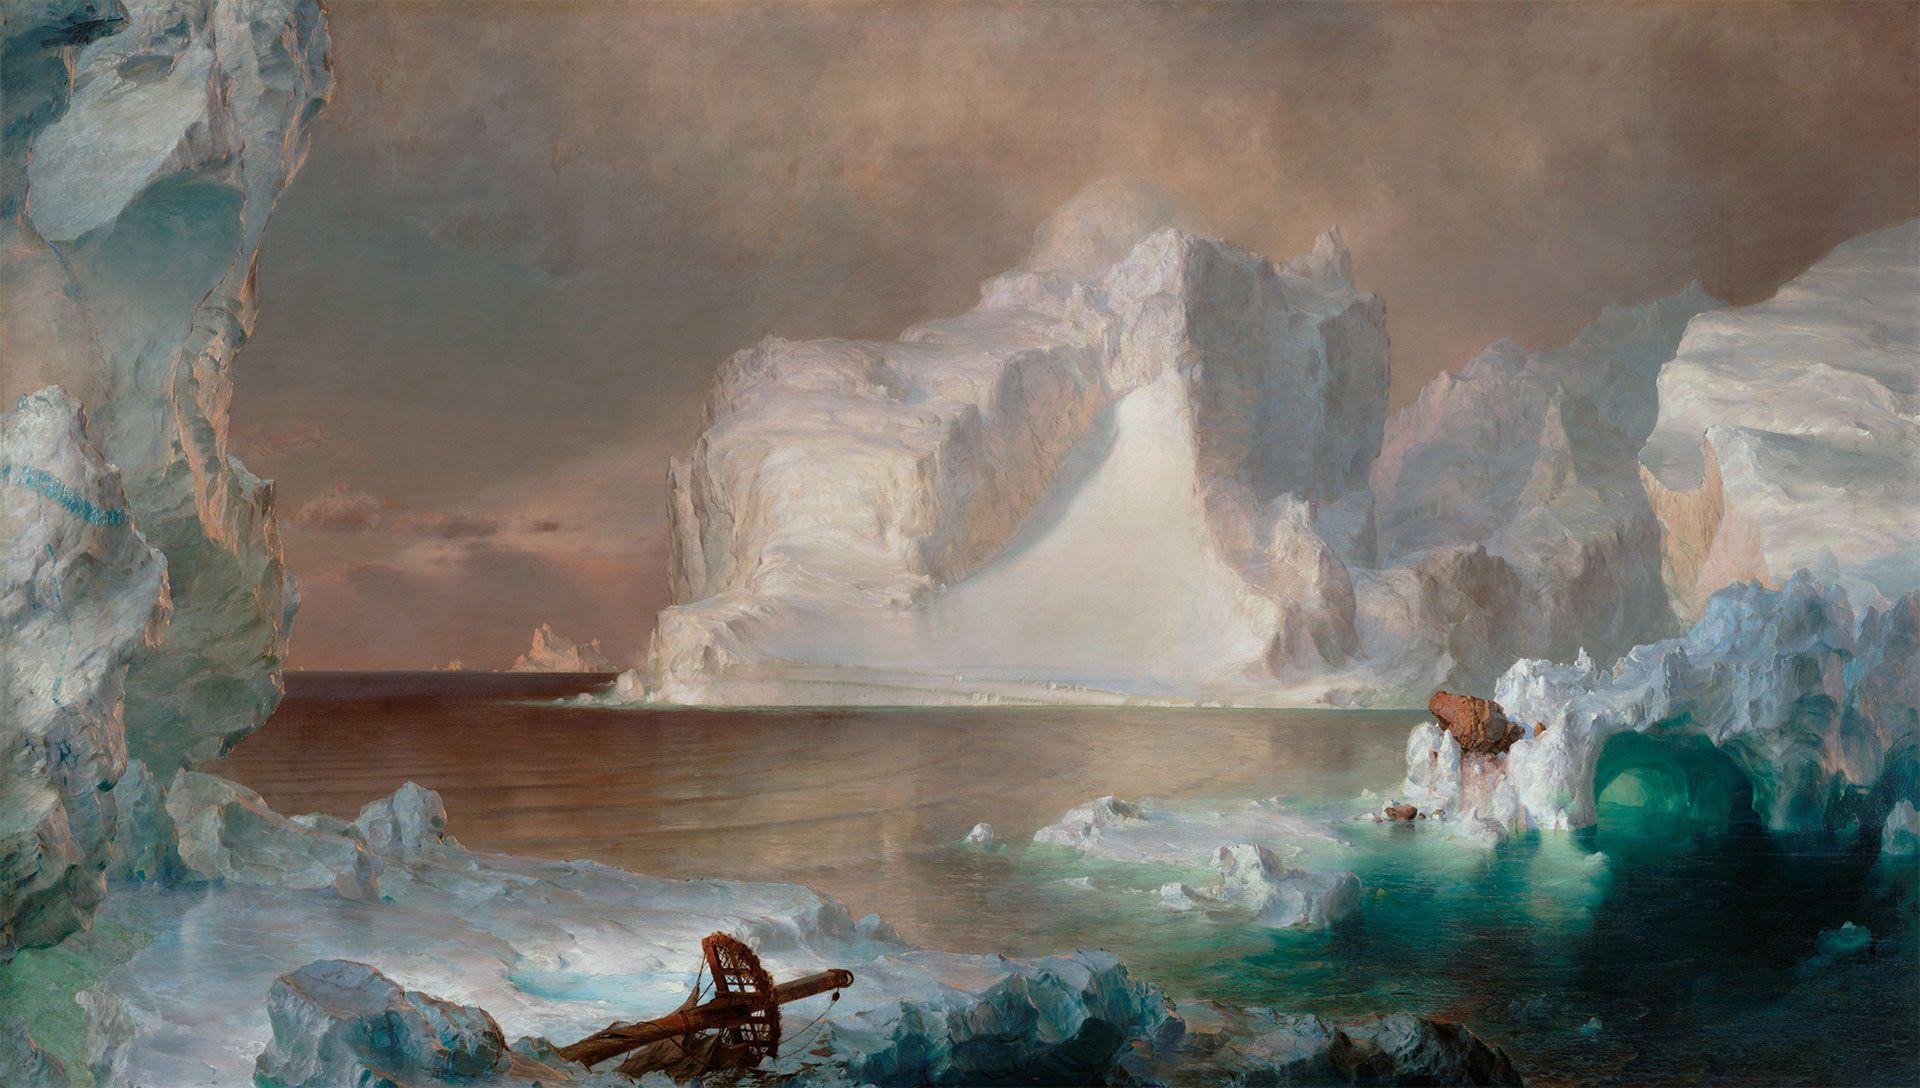 Frederic Edwin Church, The Icebergs